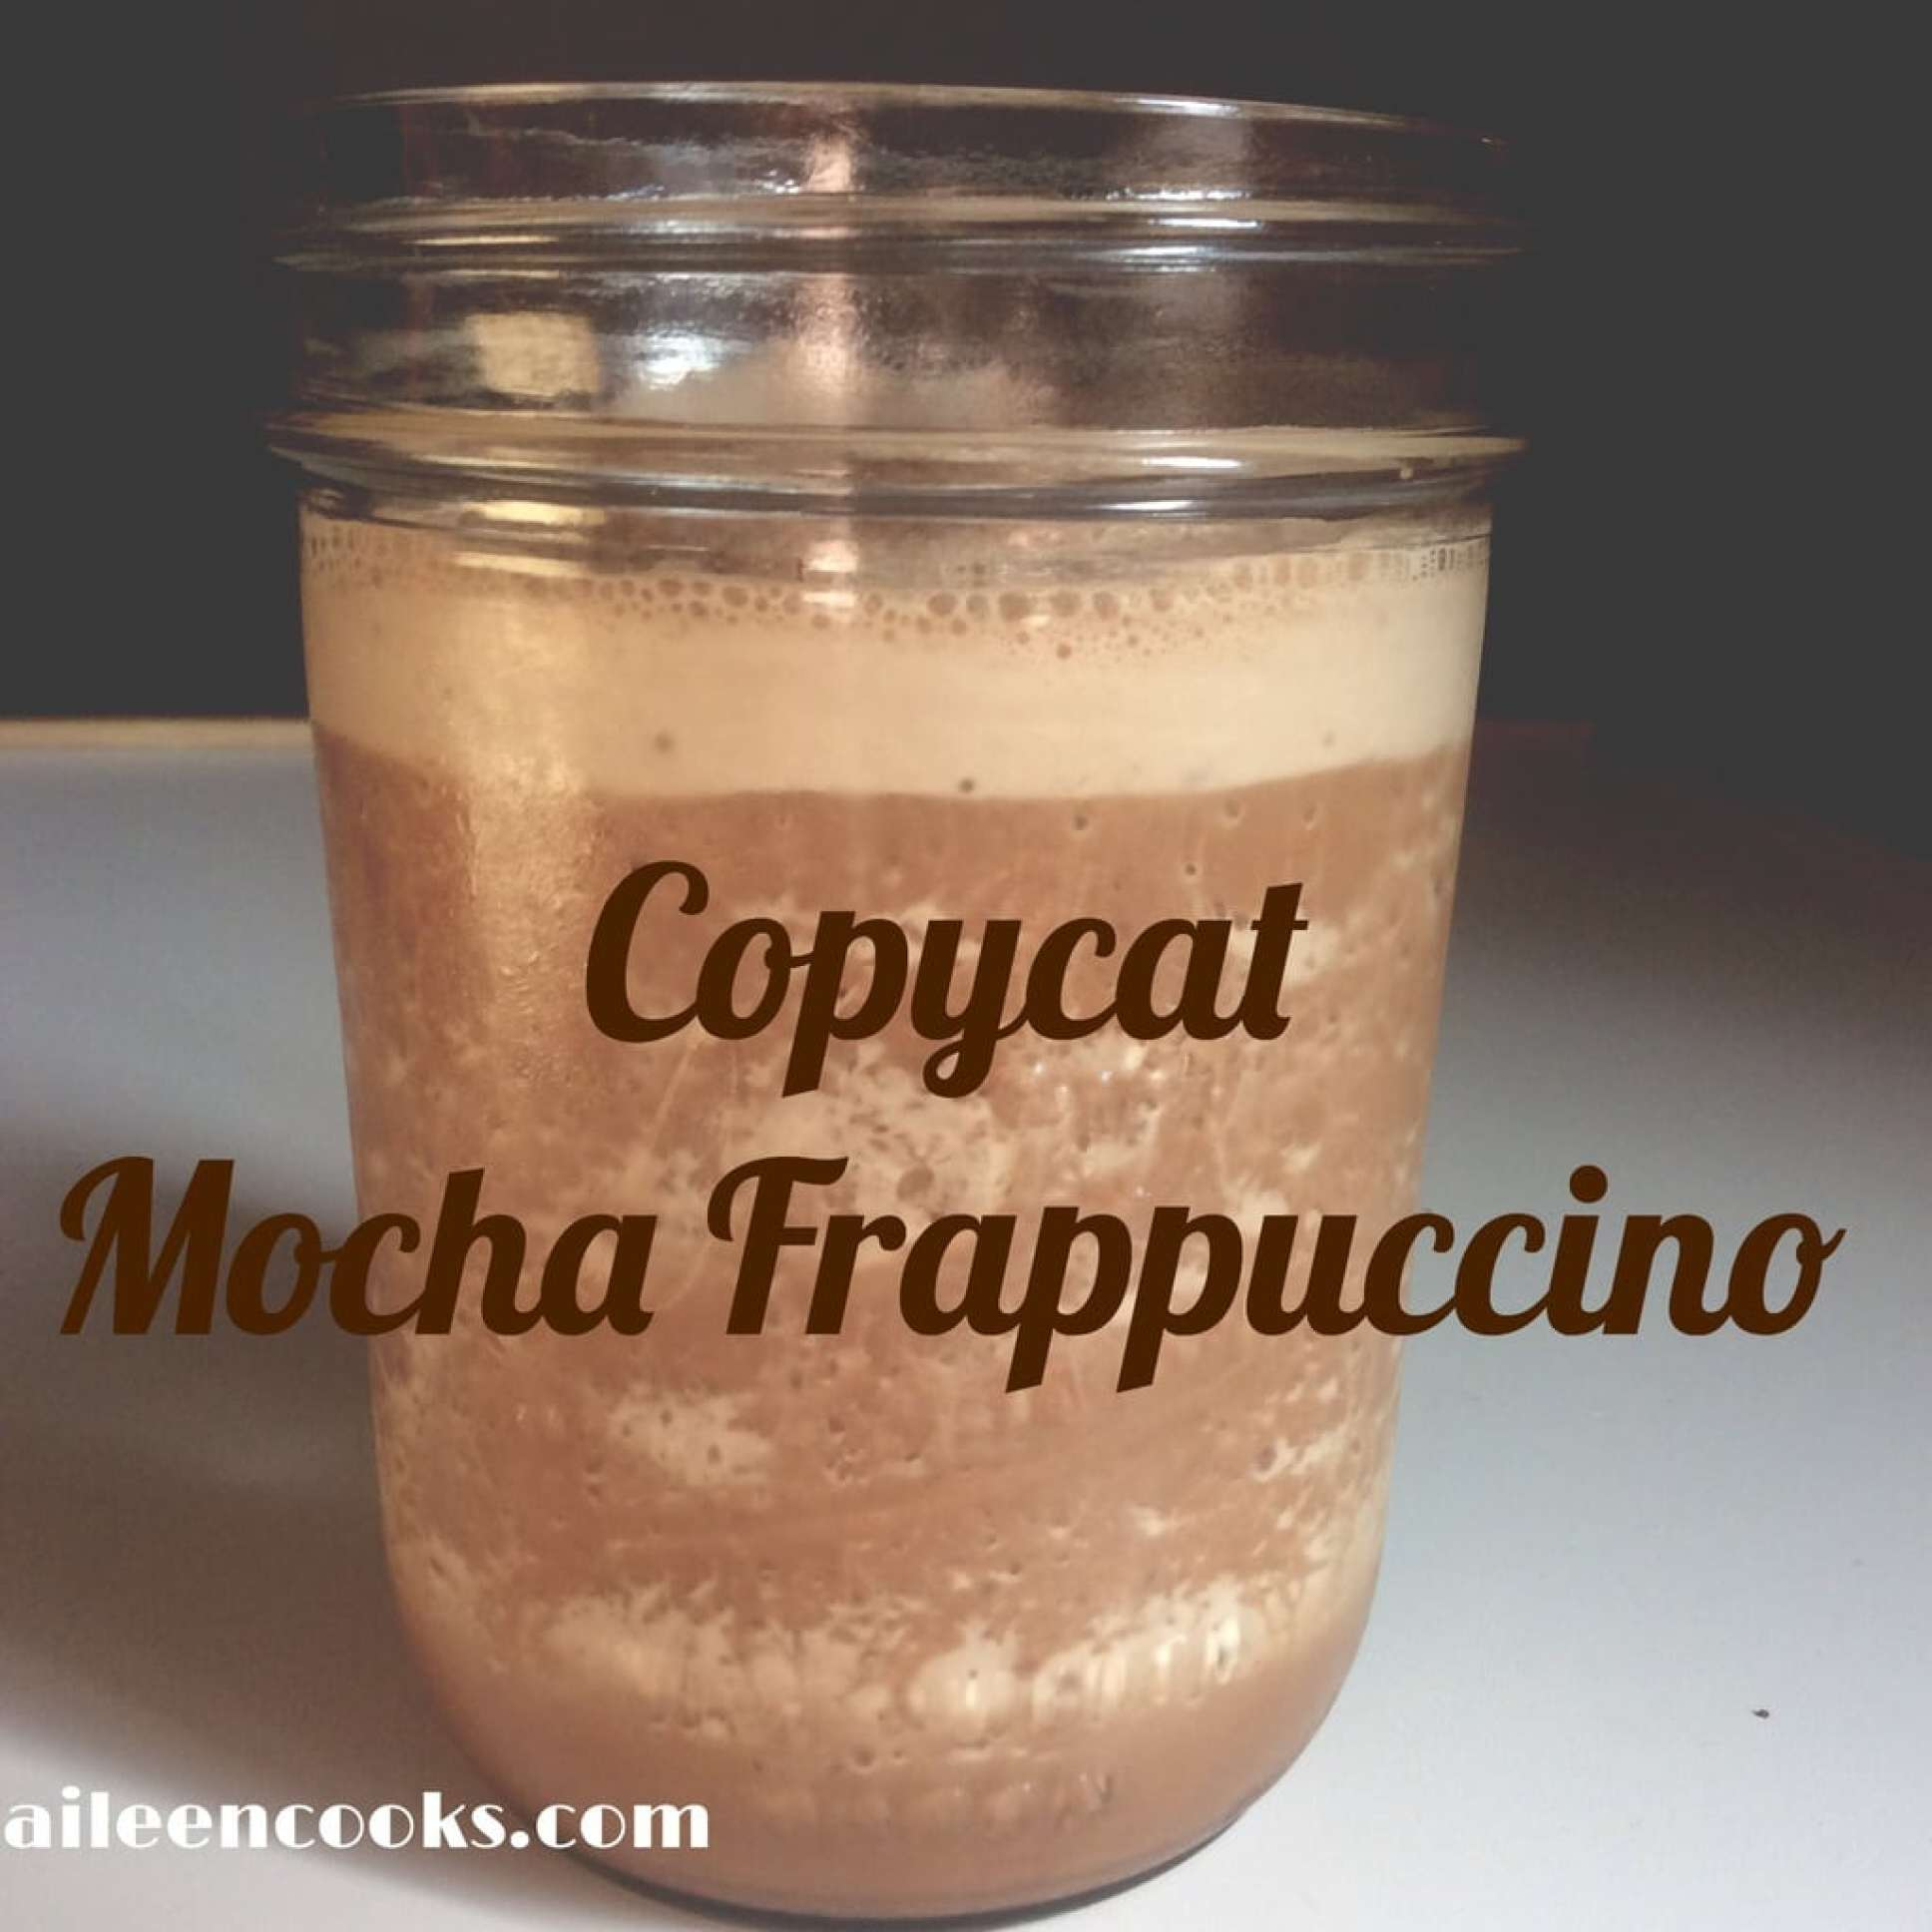 Copycat Mocha Frappuccino | aileencooks.com